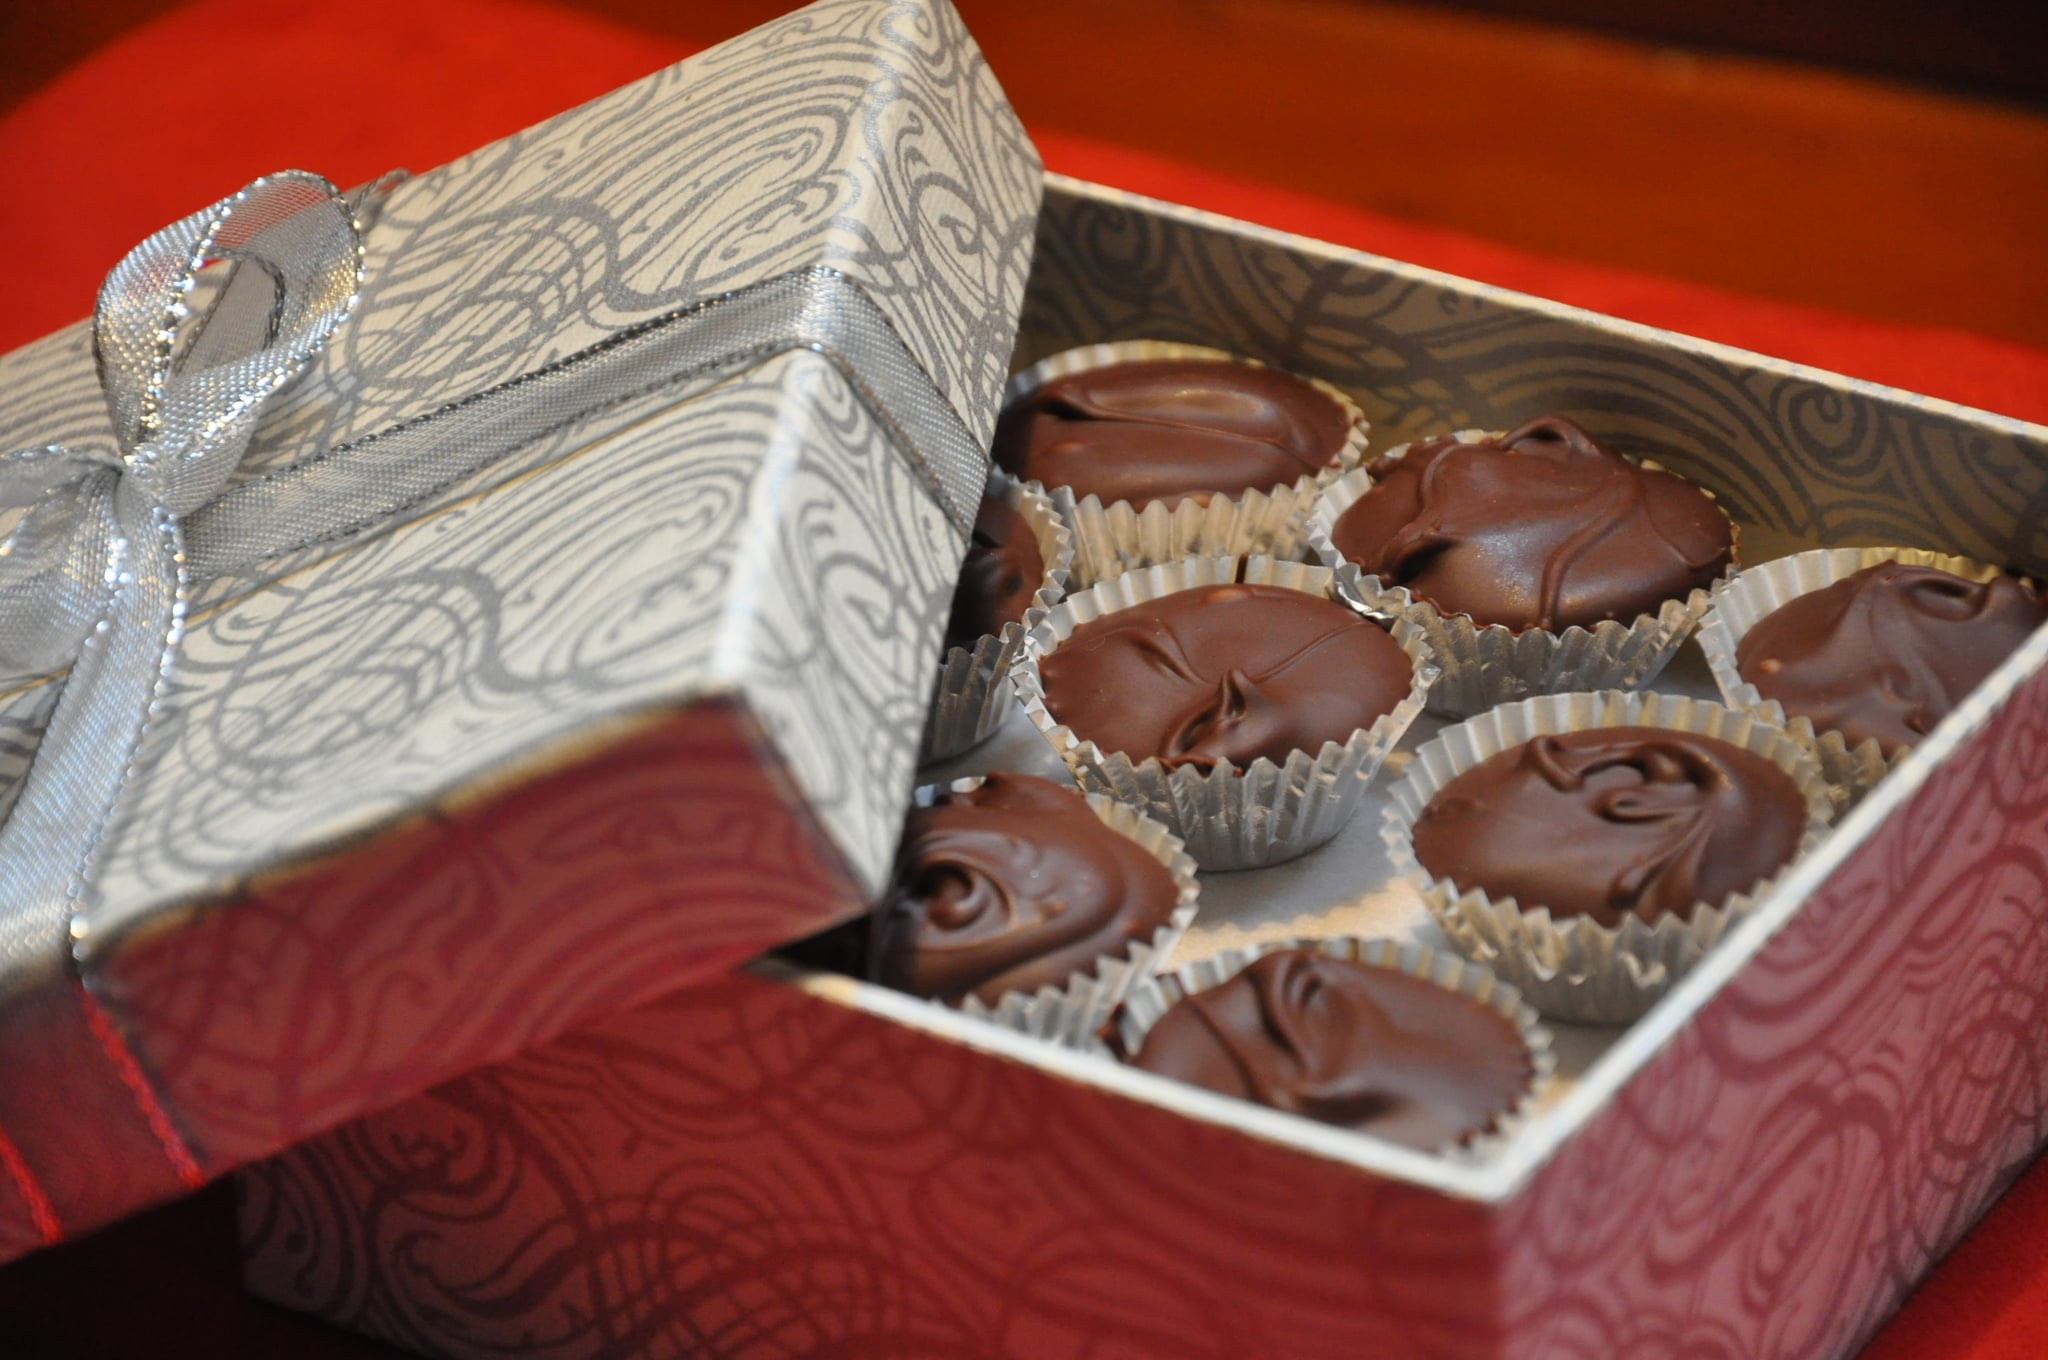 Homemade Chocolate Peanut Butter Cup Recipe   POPSUGAR Food